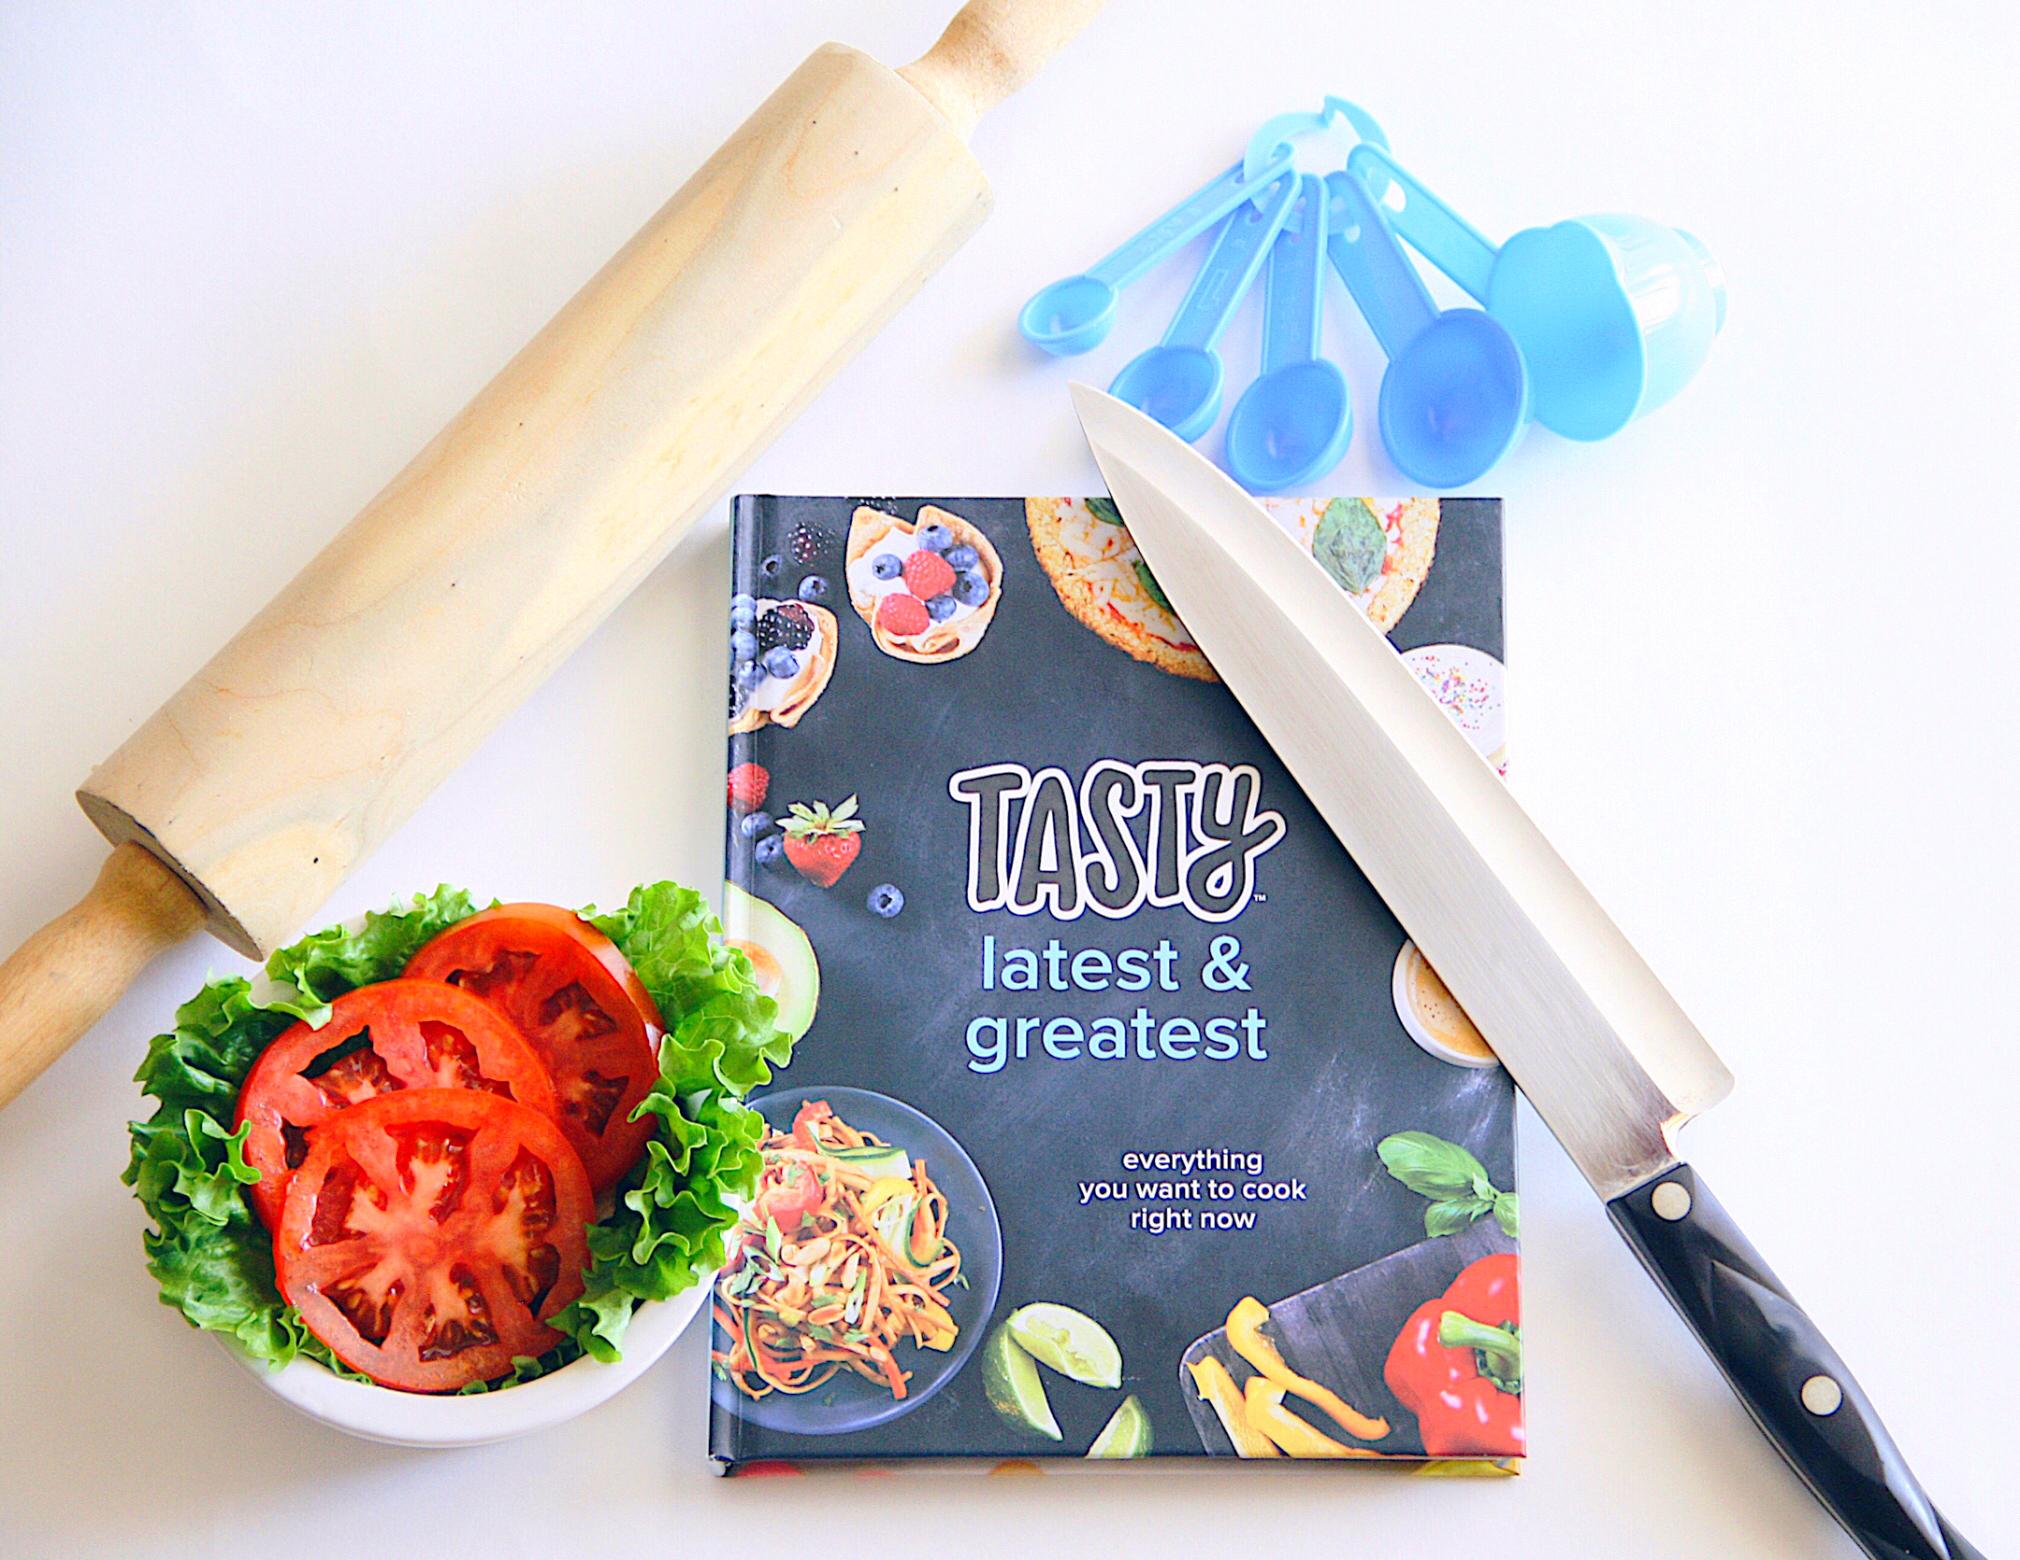 tasty greatbest. A9b50529ffdcb64e81e6927f295935cbceeaa597 Cooking with my Tasty Cookbook  LifeMeetsCristina